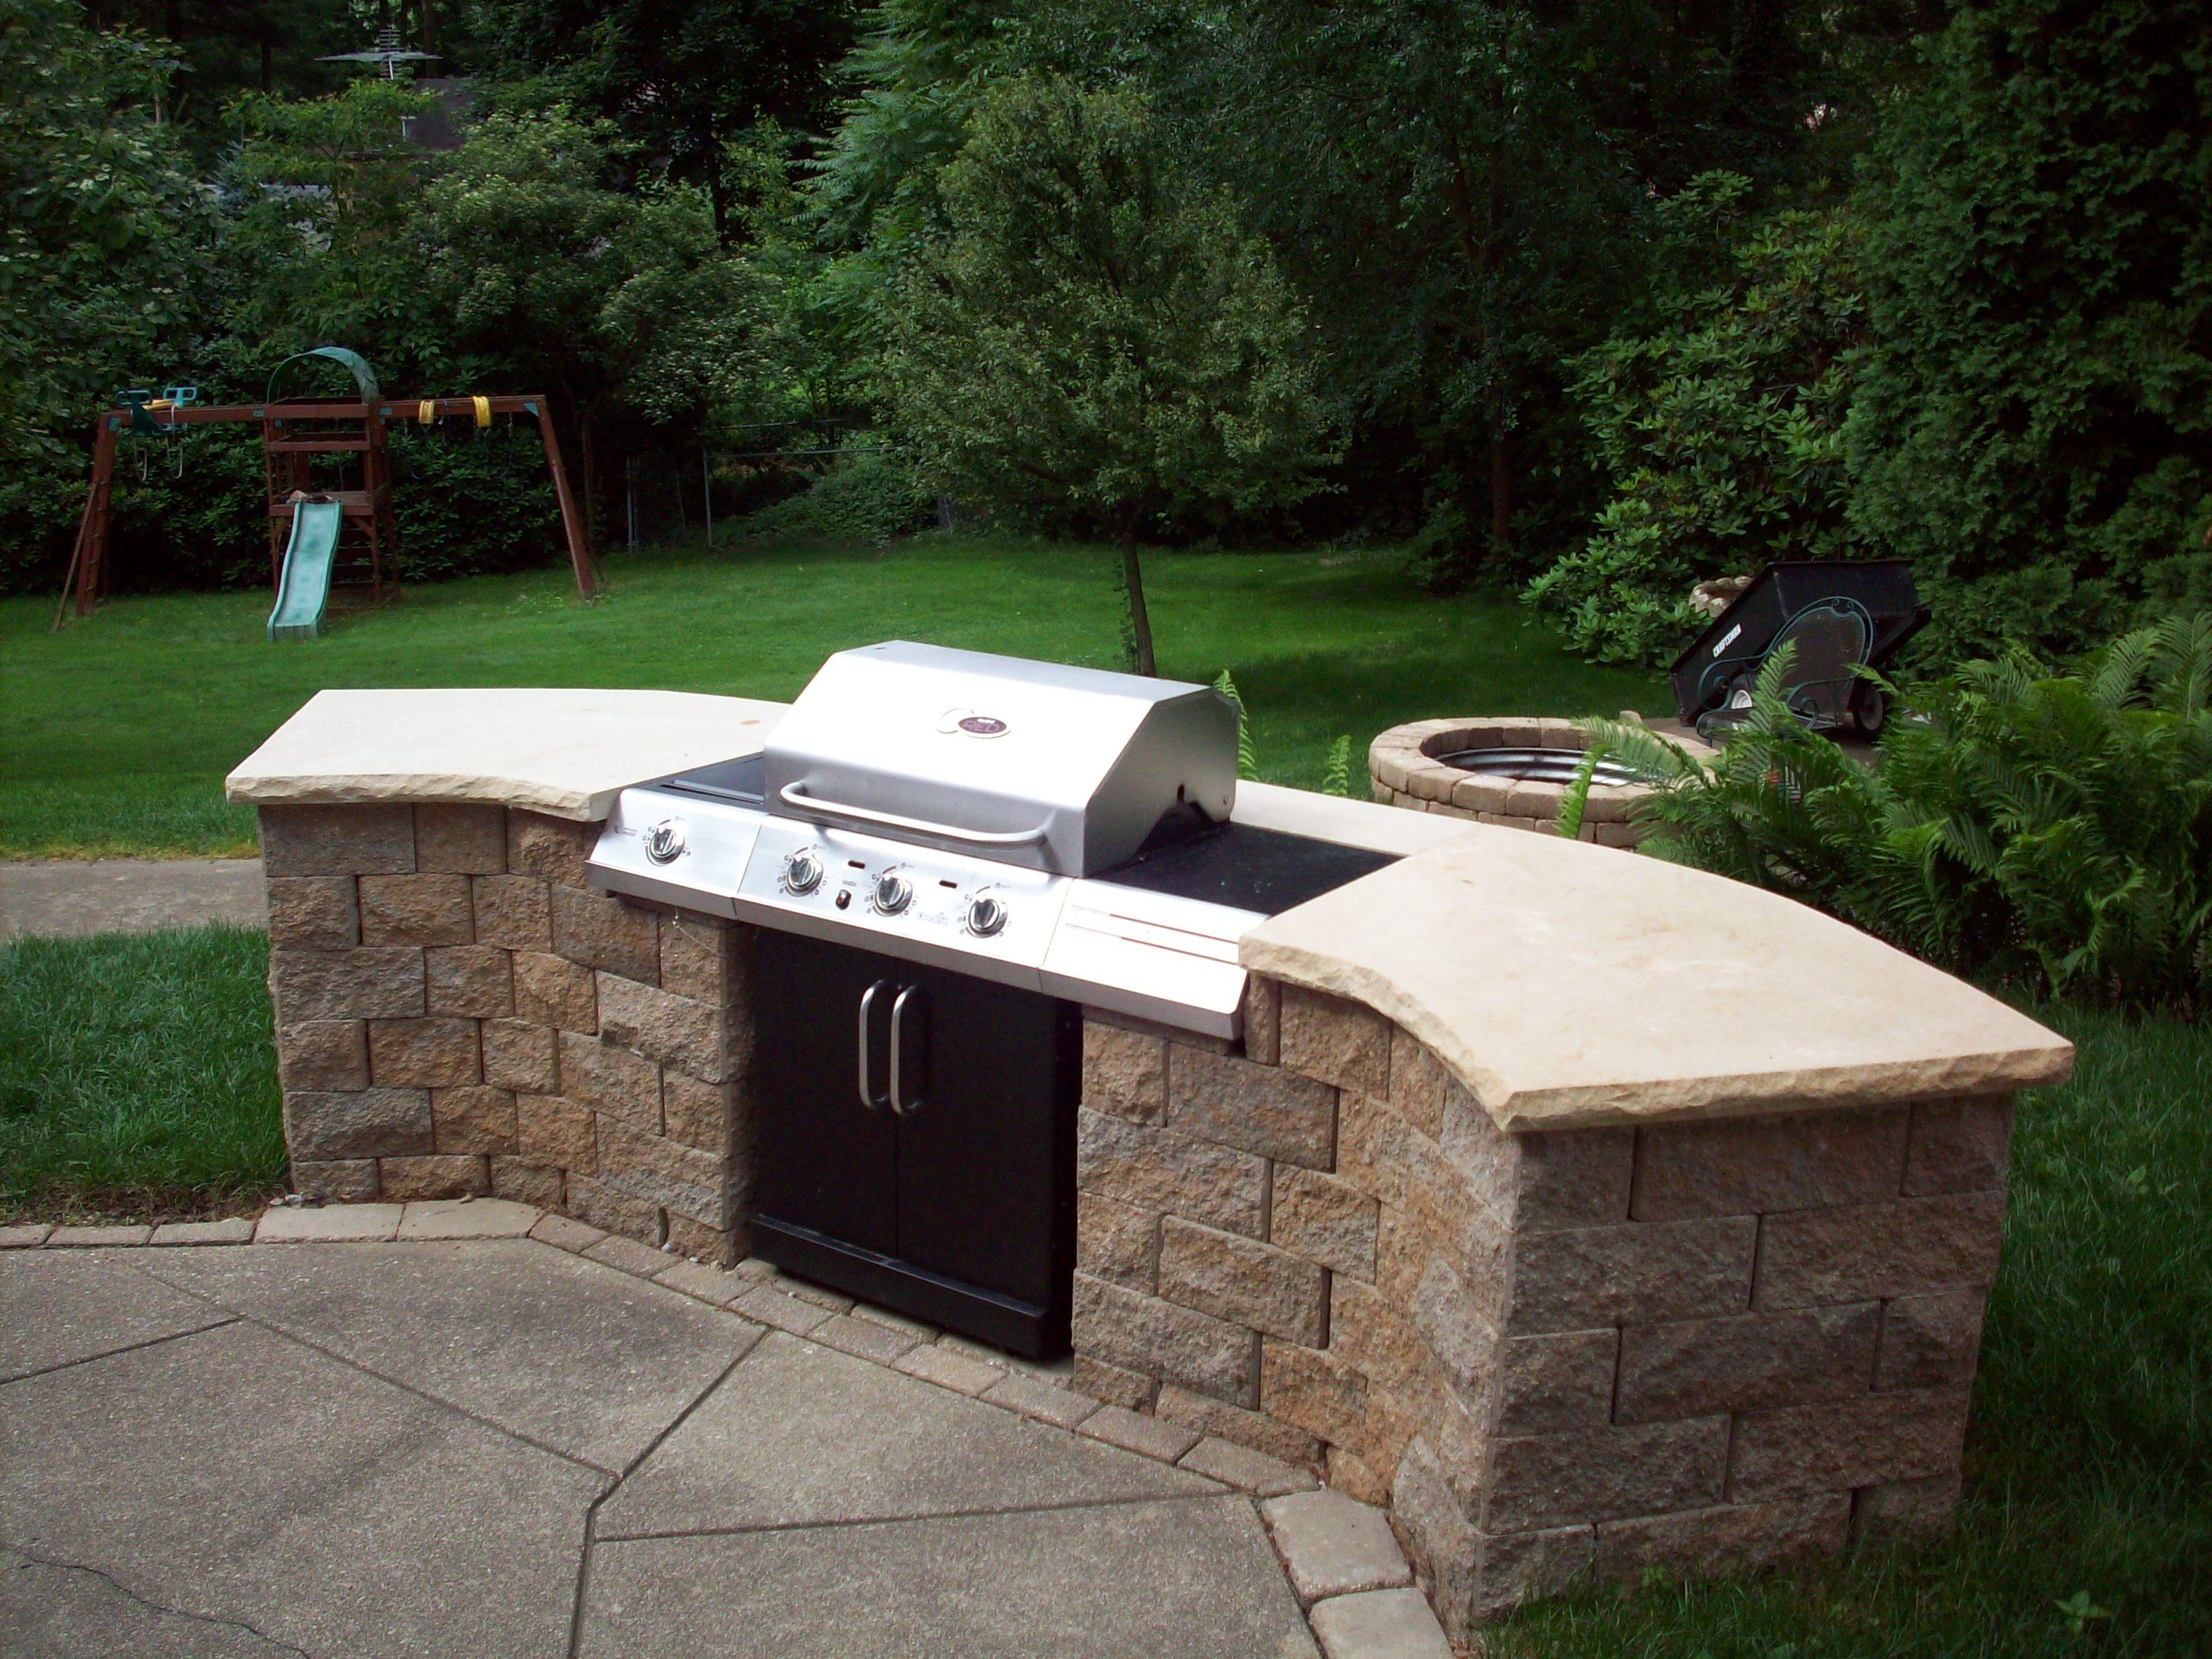 custom built in barbecue modern home exteriors. Black Bedroom Furniture Sets. Home Design Ideas